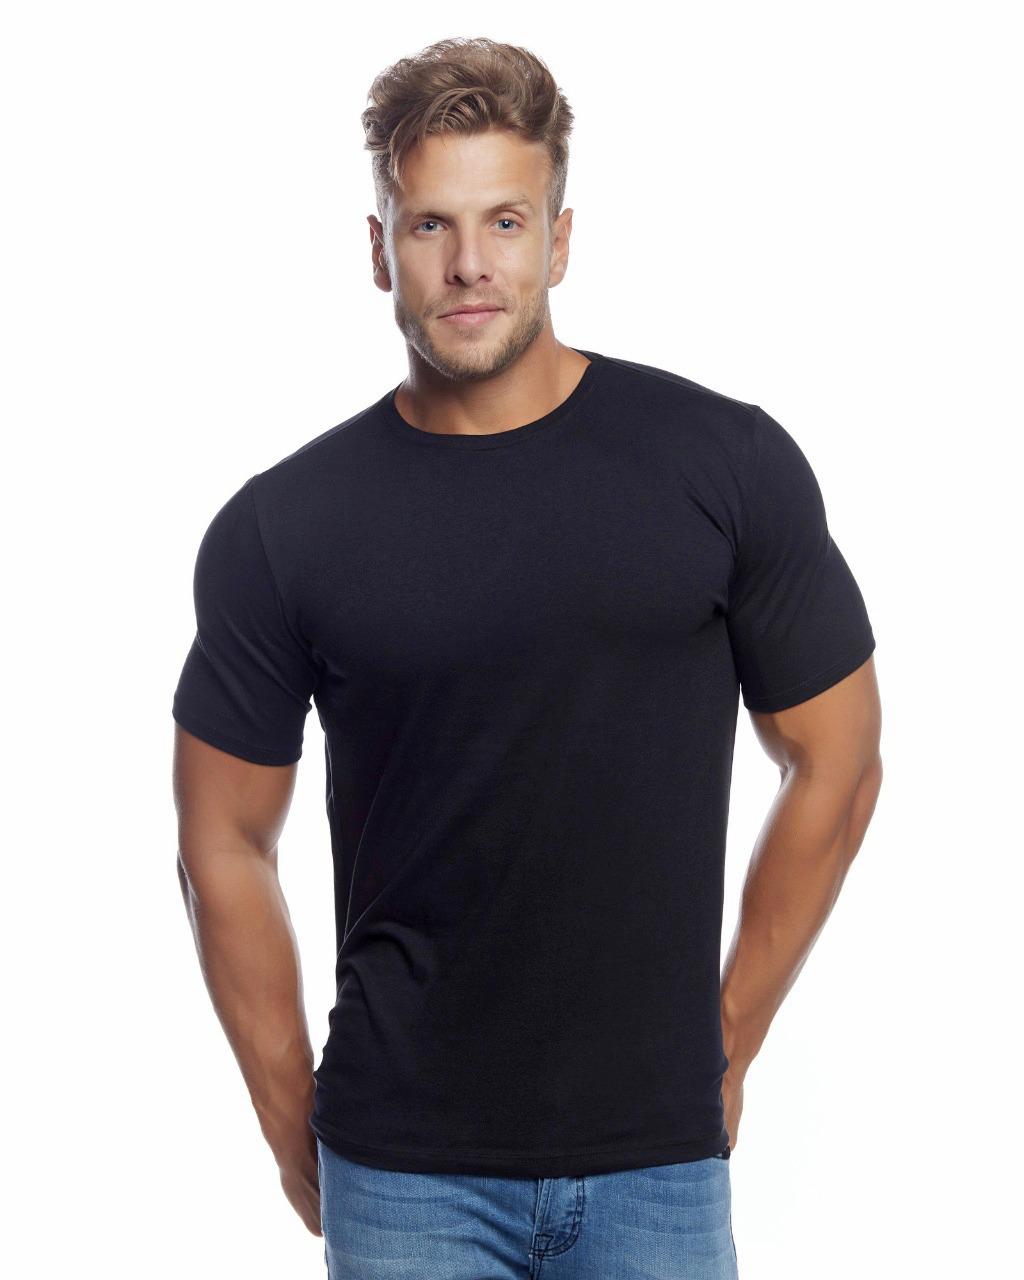 Camiseta Cotton Stretch Masculina Evolvee